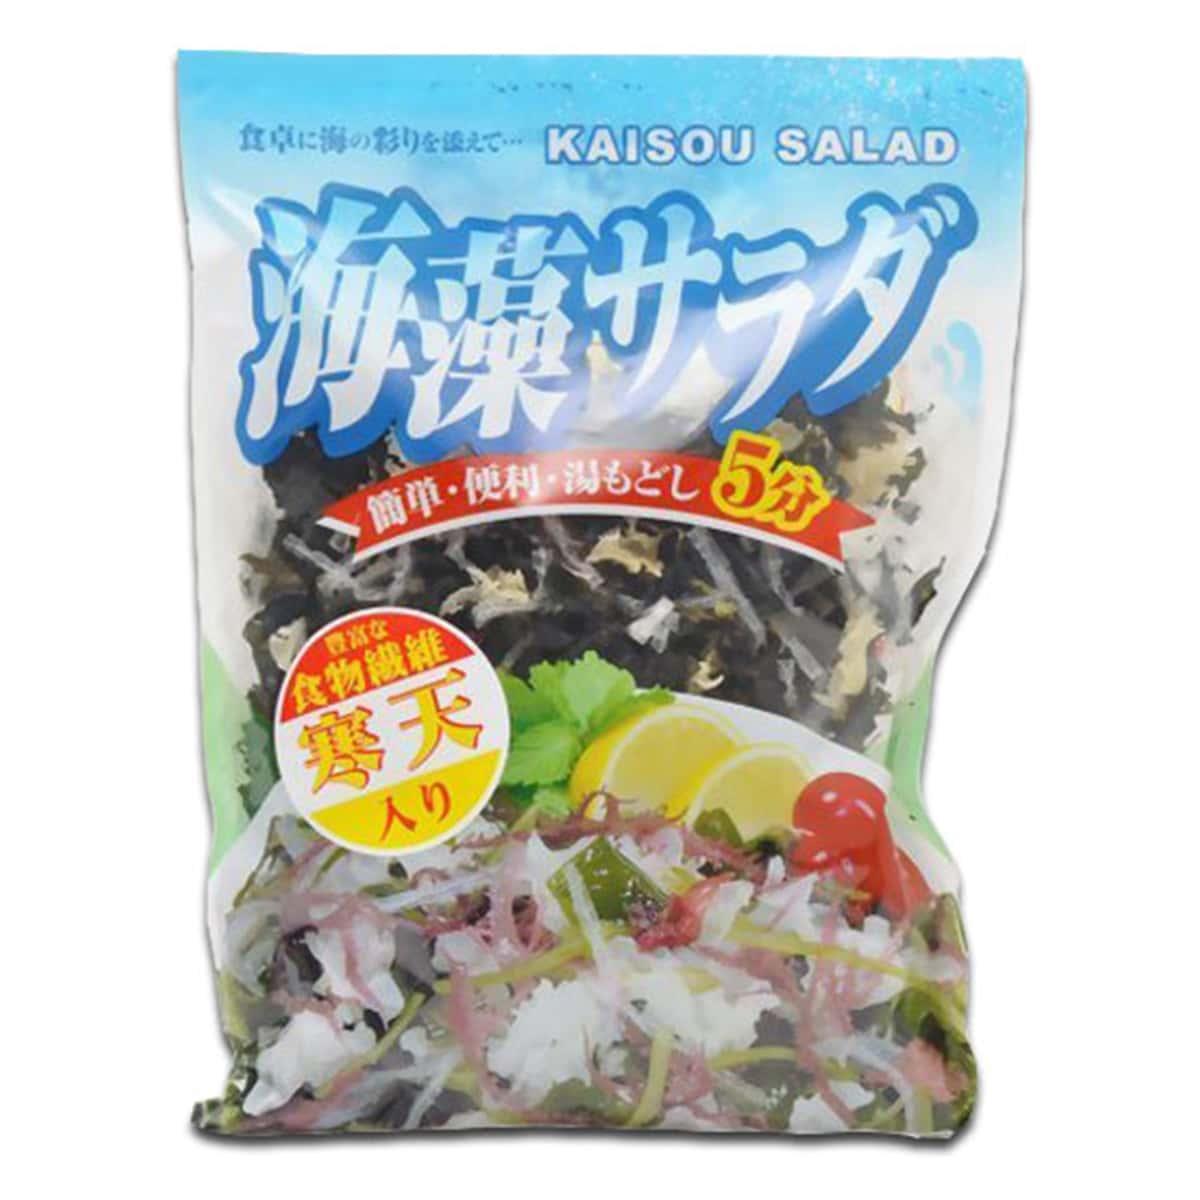 Buy Sanko Dried Seaweed Salad (Kaiso Salad) - 90 gm